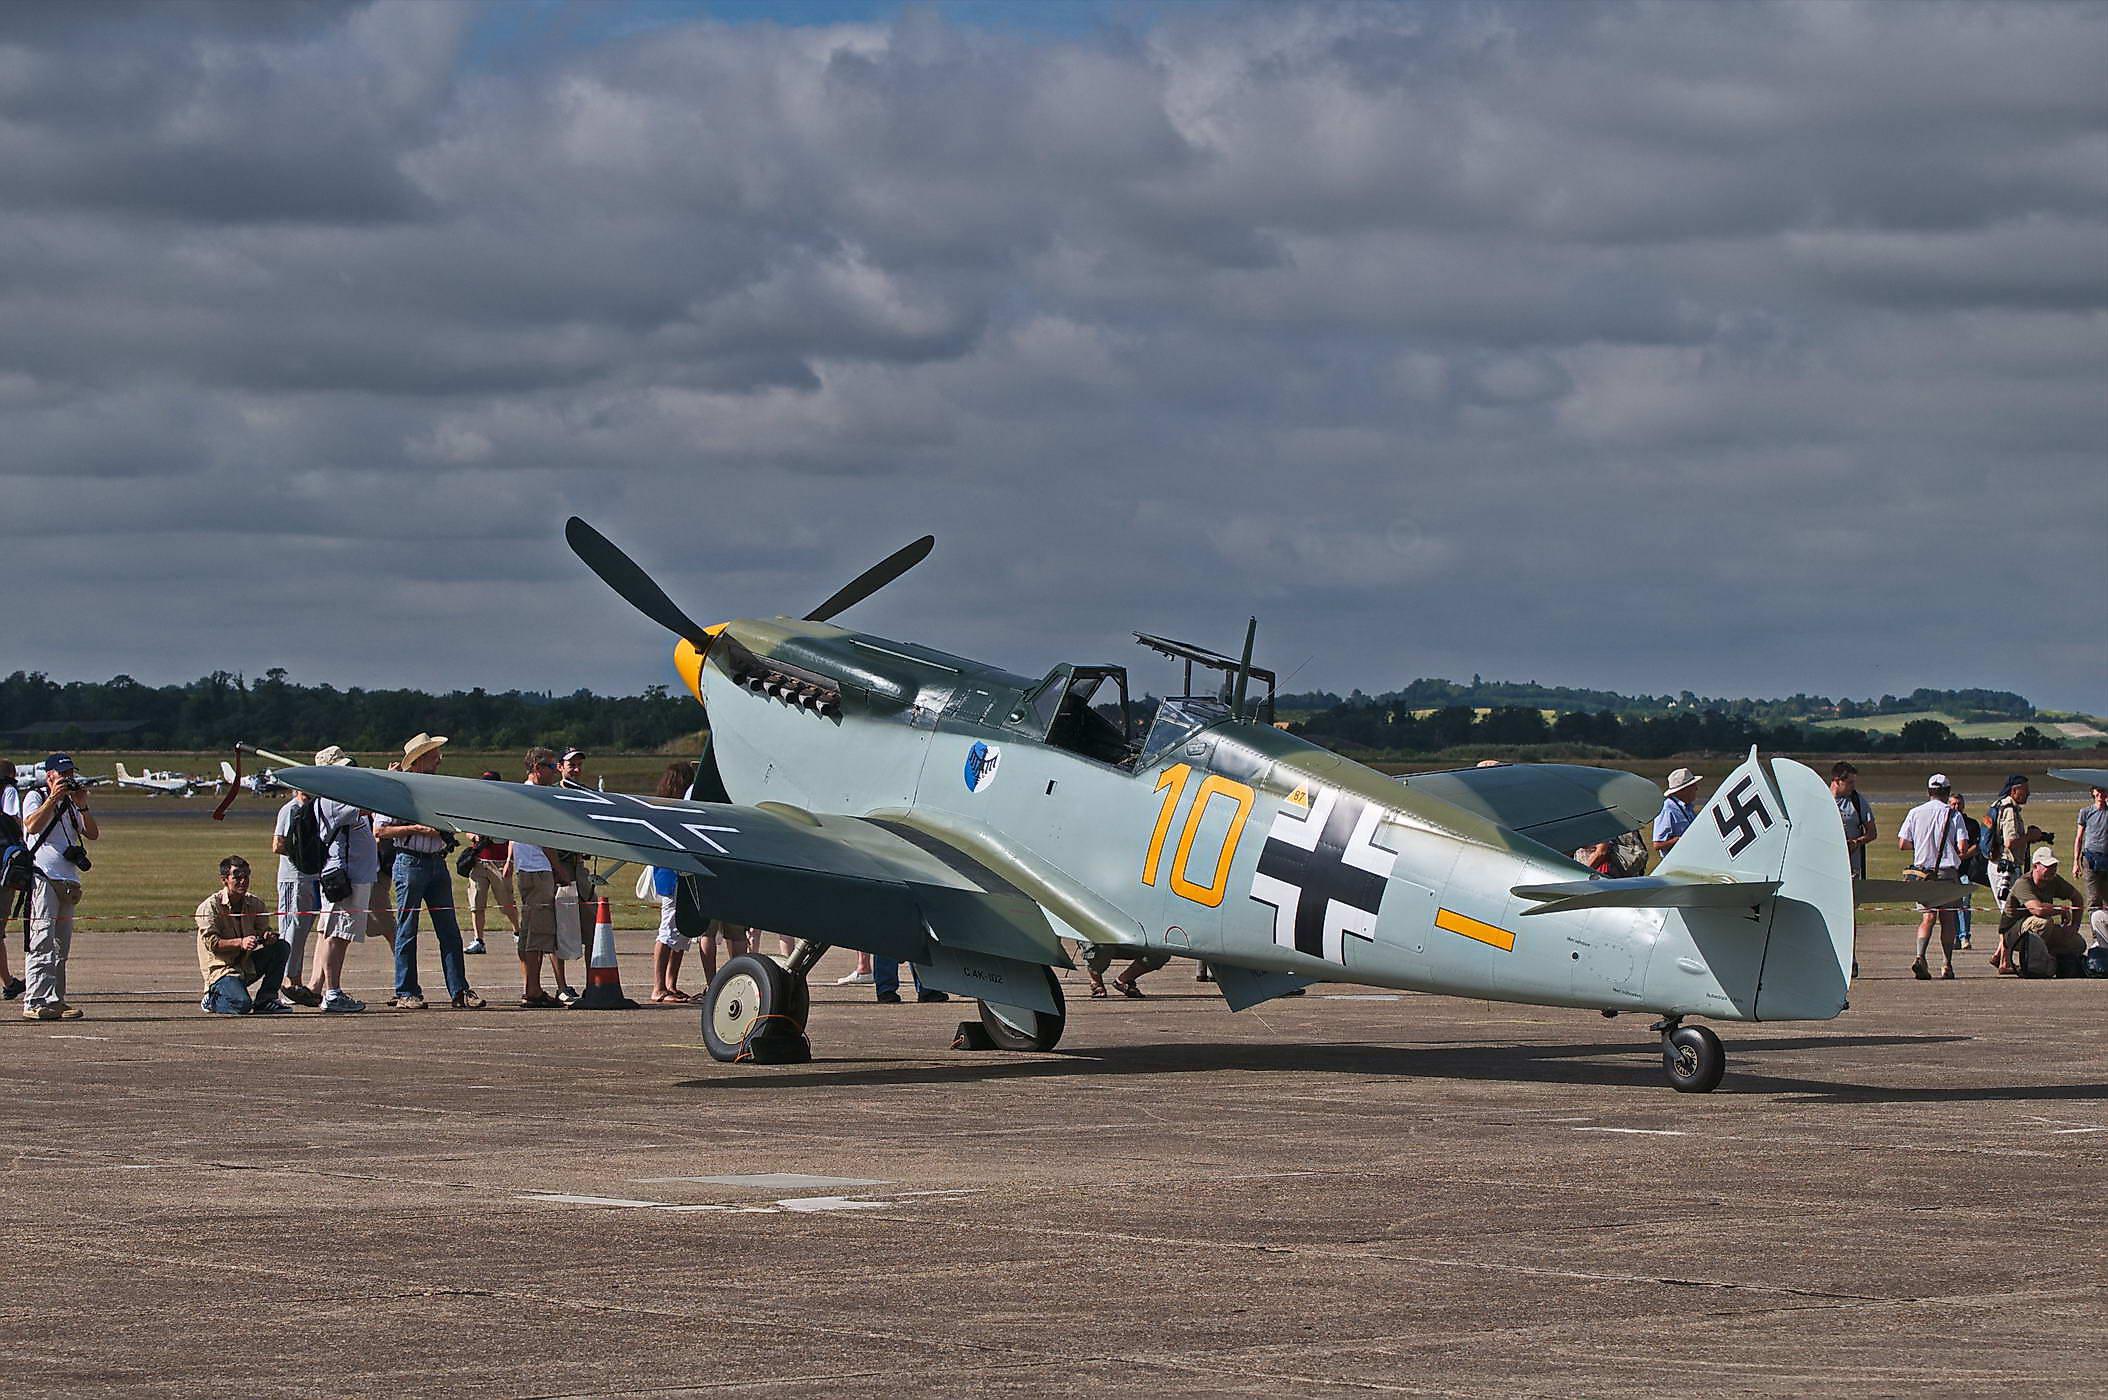 Hispano Buchon HA-1112-MIL C.4K-102 -Yellow